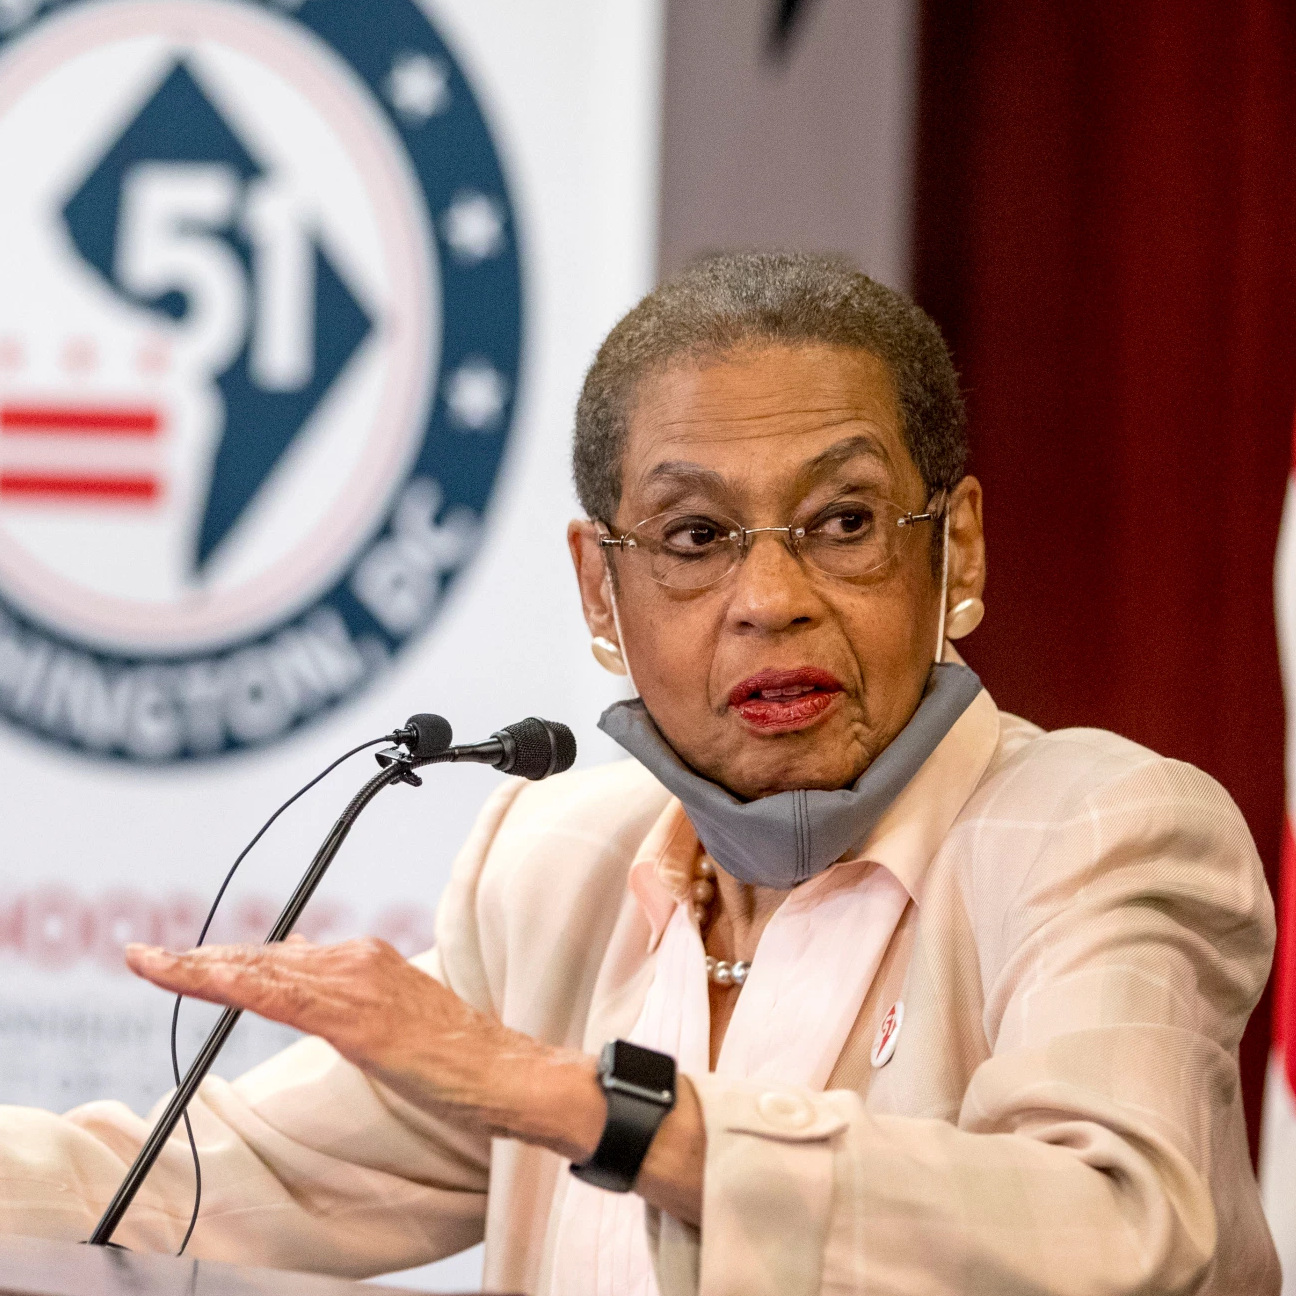 Congresswoman Norton